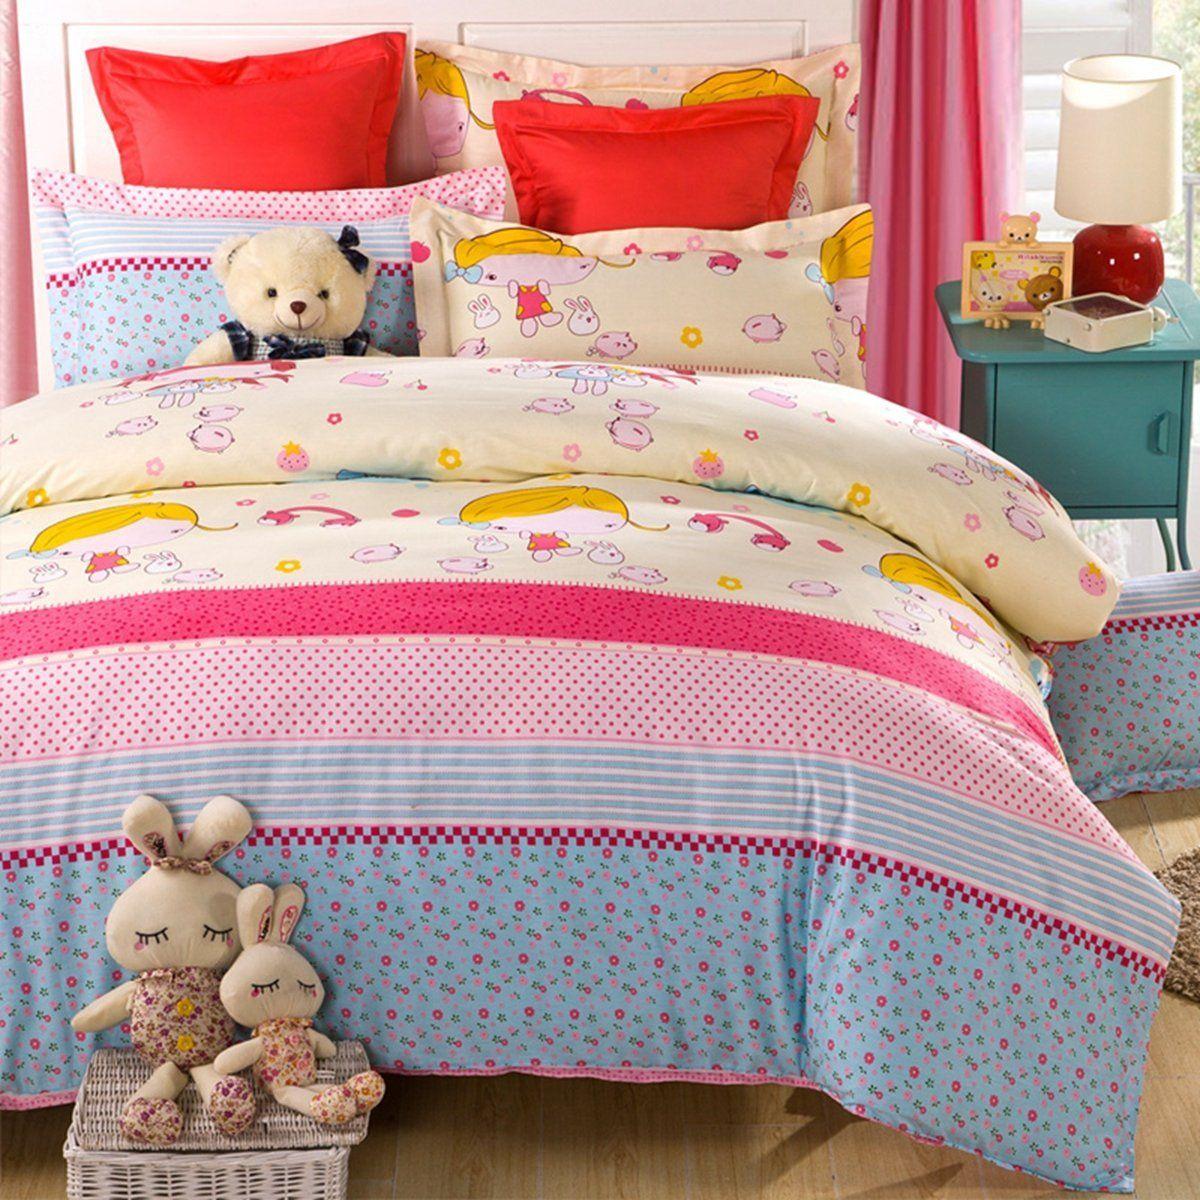 CASA 100% Cotton Kids Bedding Cute Girl Duvet Cover Set & Flat sheet,4 Piece,Queen //Price: $95.67 & FREE Shipping //     #hashtag3